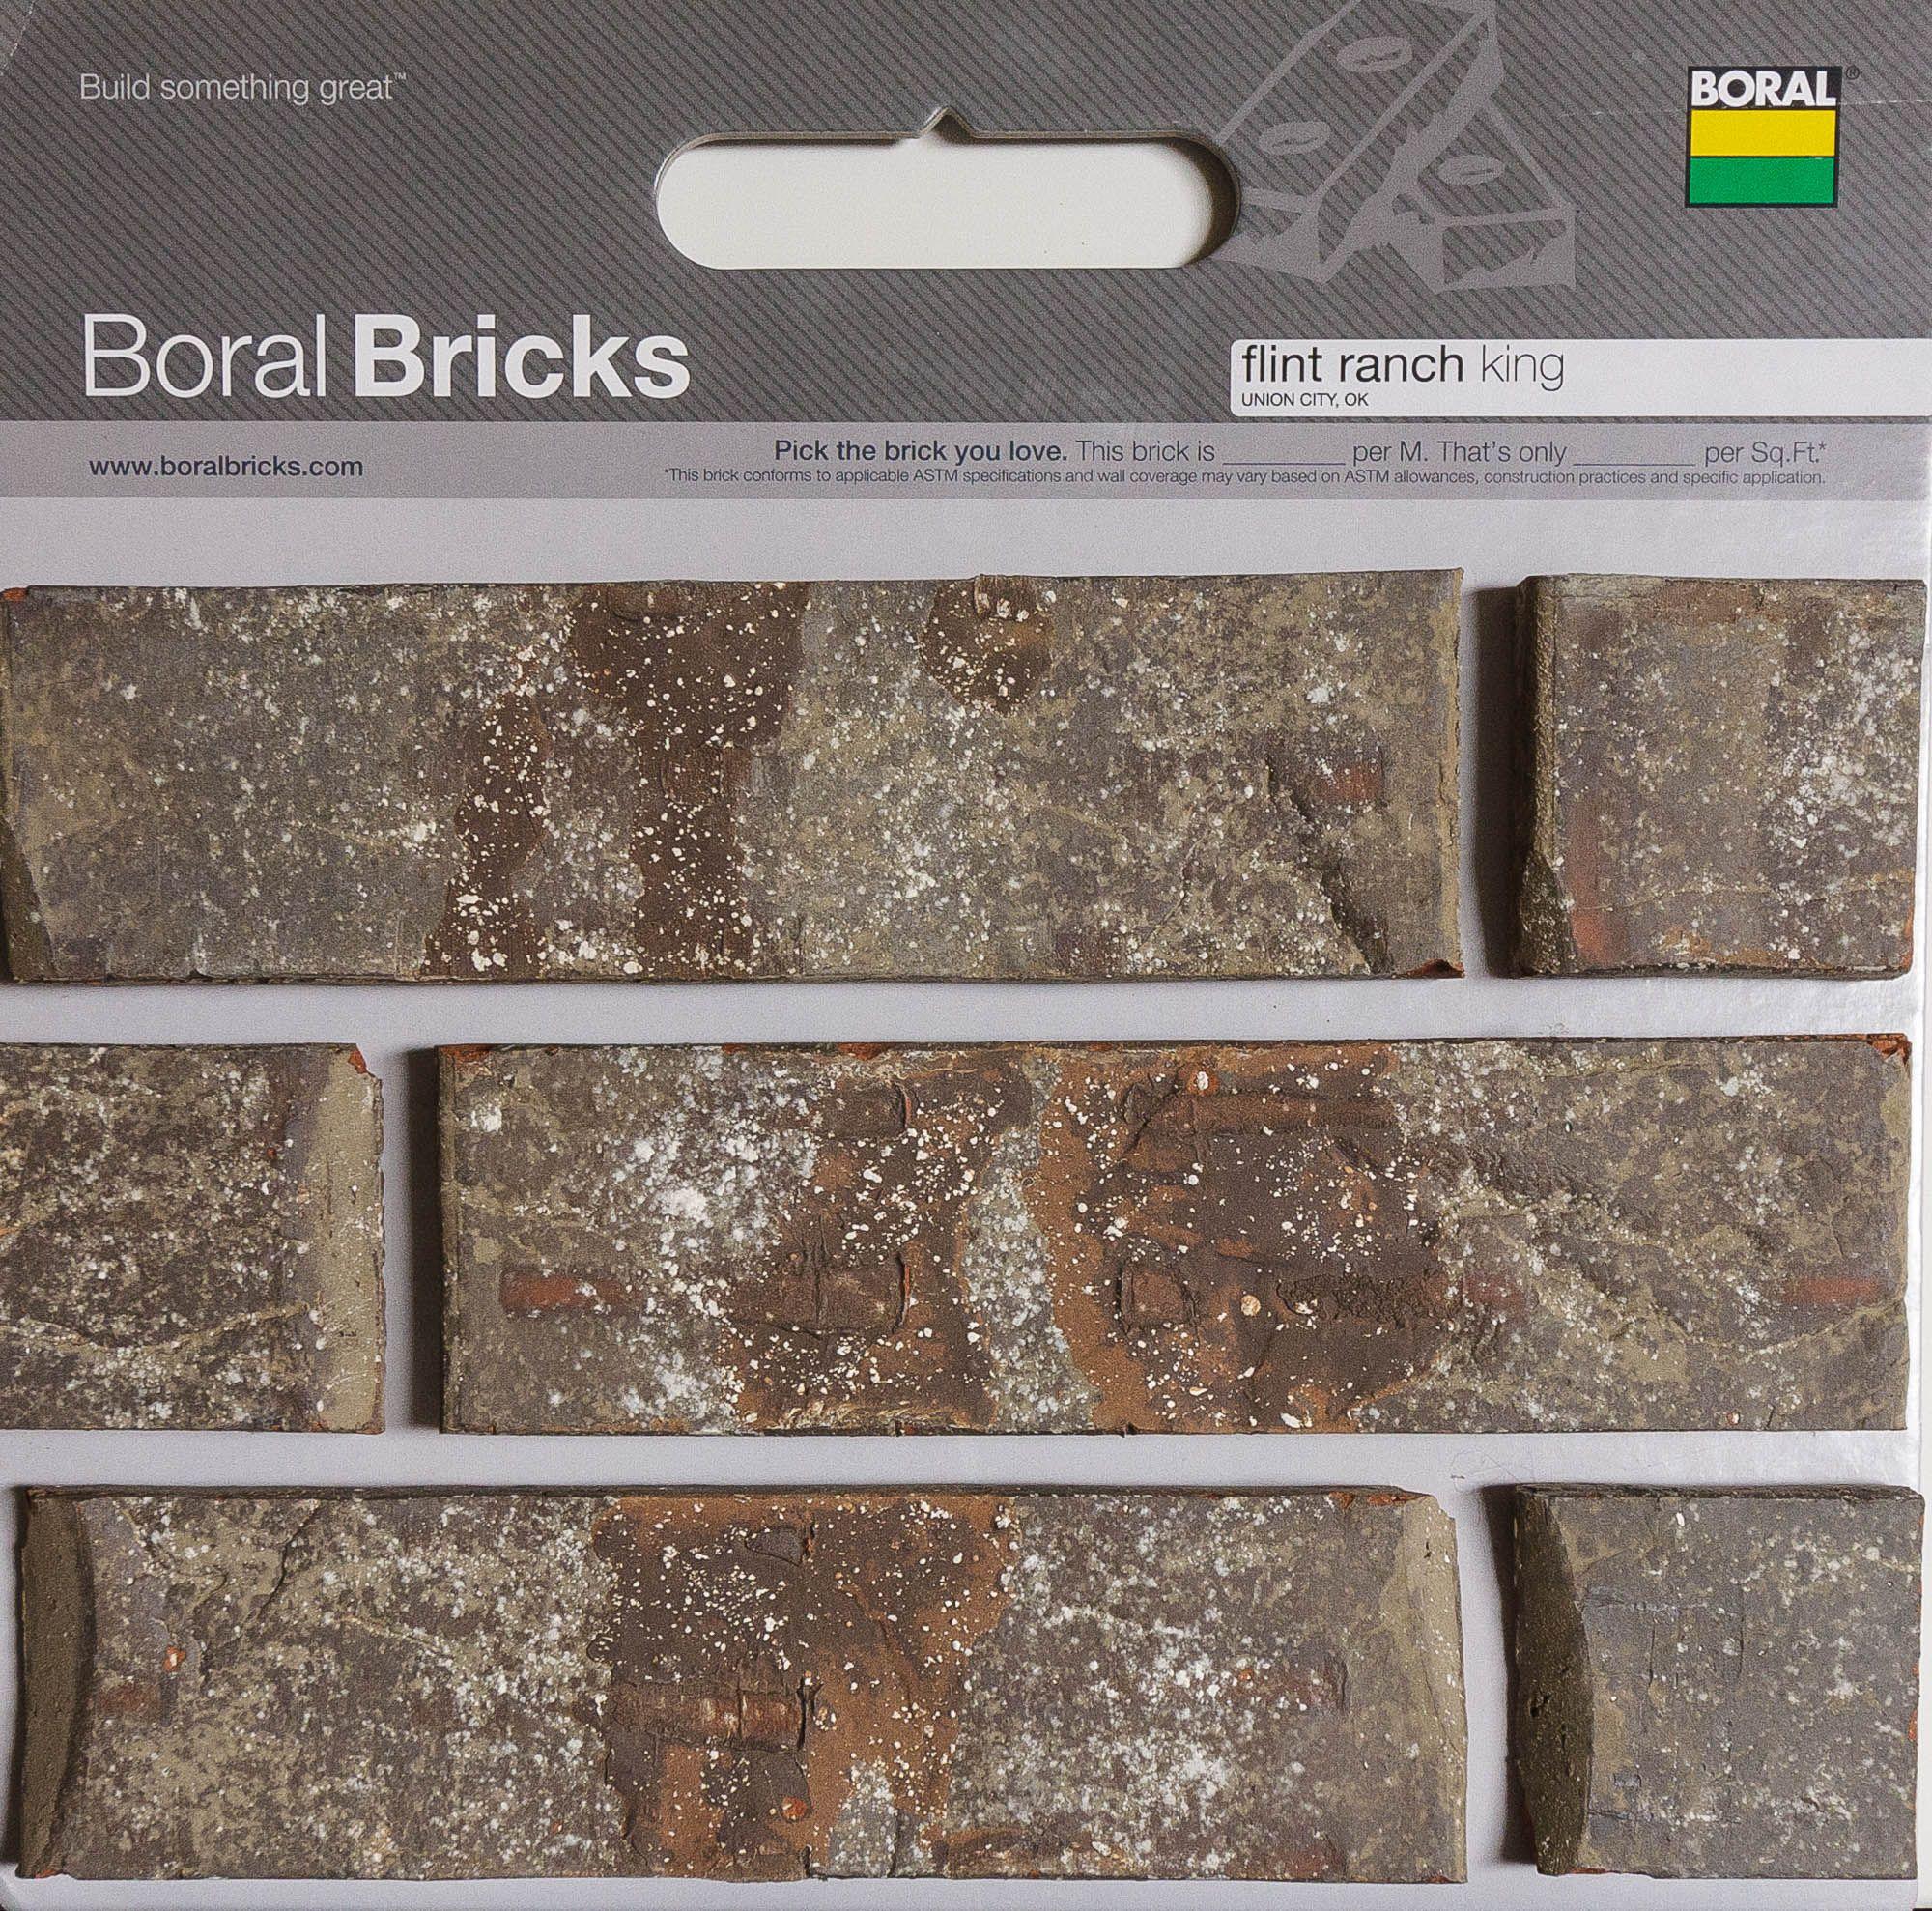 Flint Ranch BRICKSTONE How To Dry Basil Brick Farmhouse